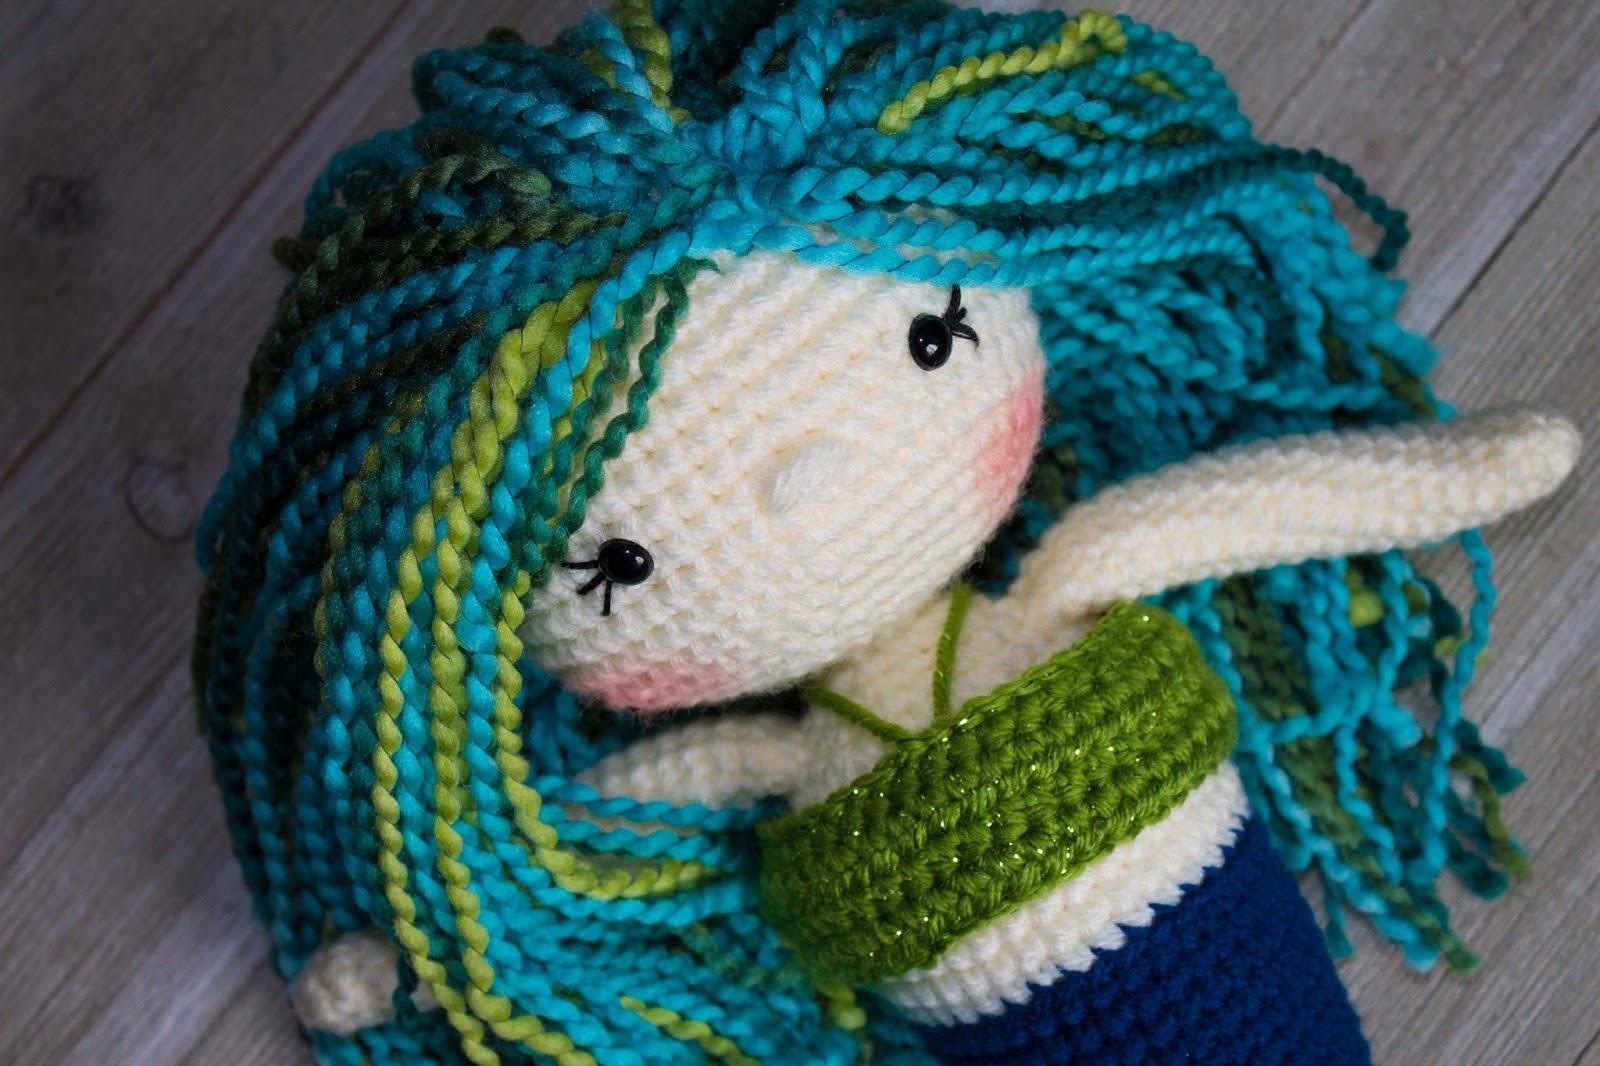 Amigurumi Pattern Dolls : Free crochet amigurumi doll pattern a basic crochet doll pattern